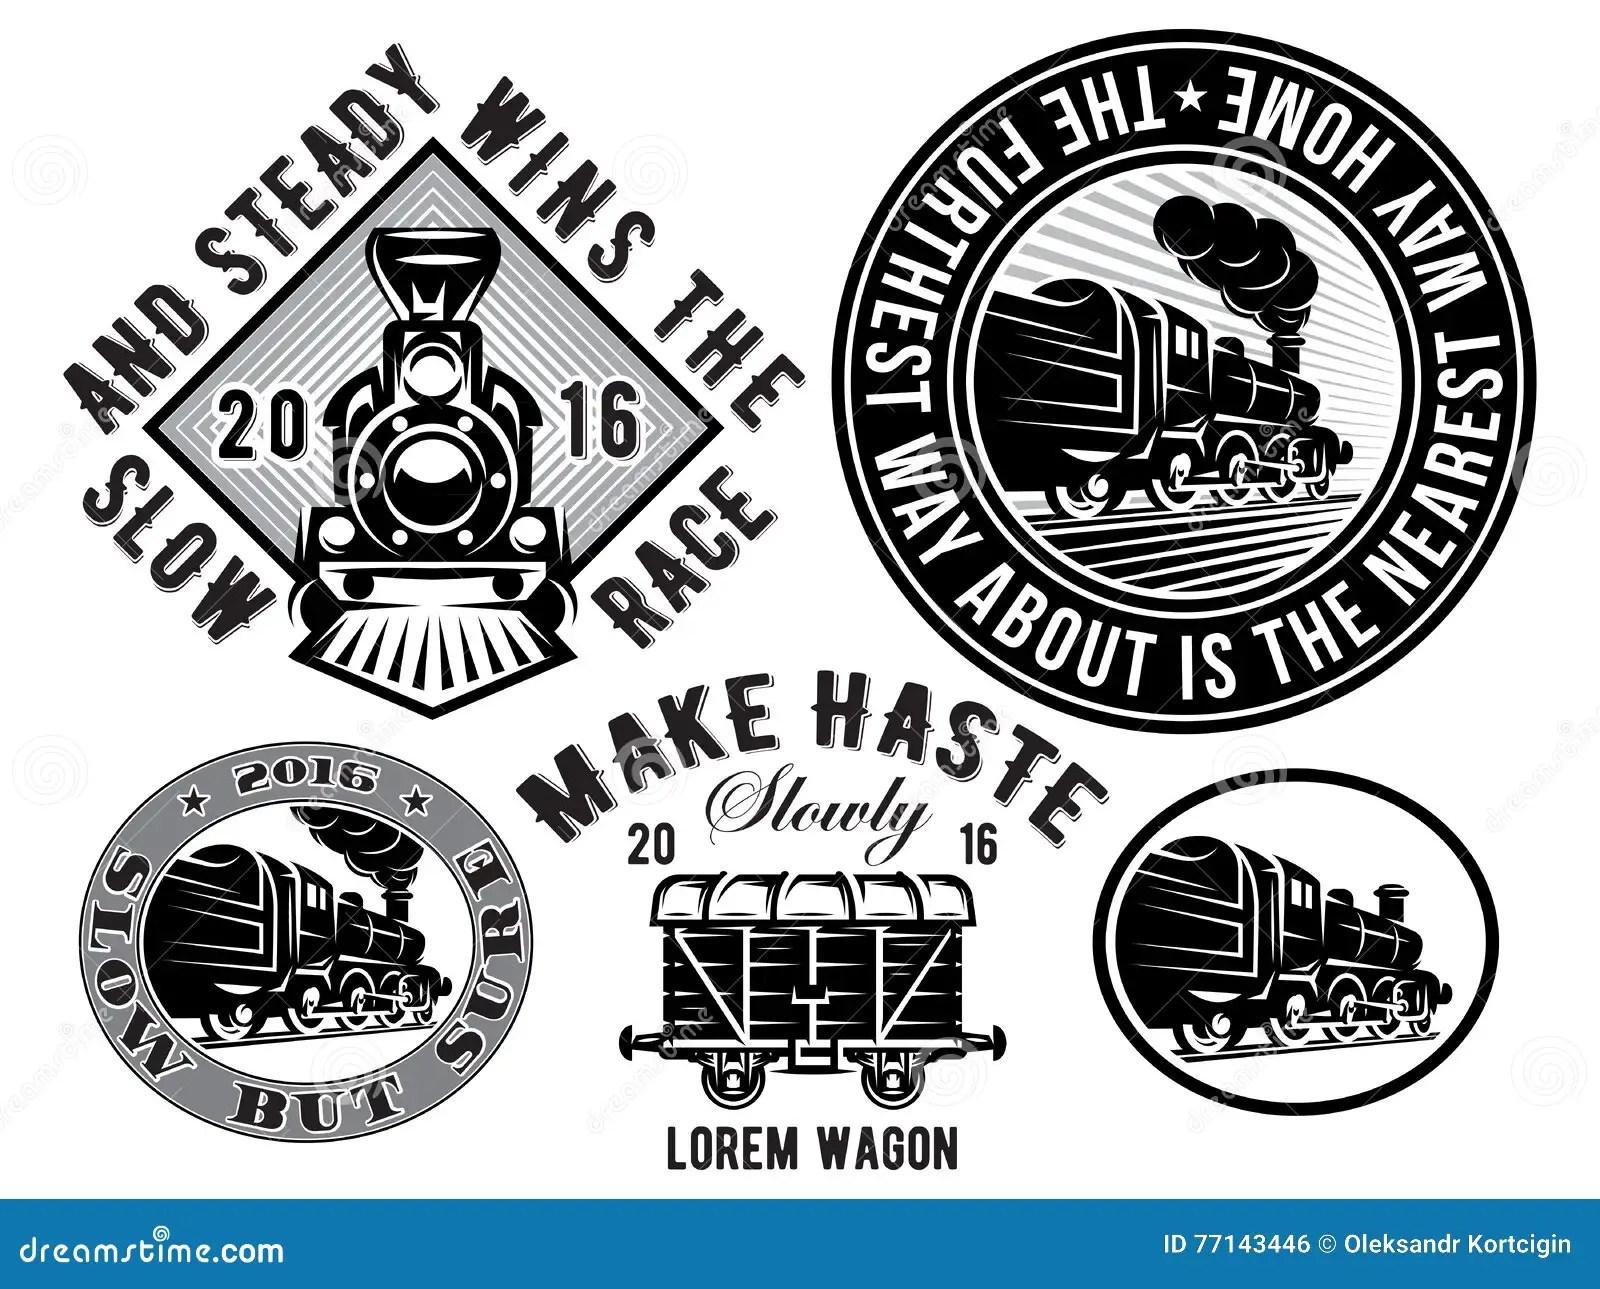 Locomotive Cartoons Illustrations Amp Vector Stock Images